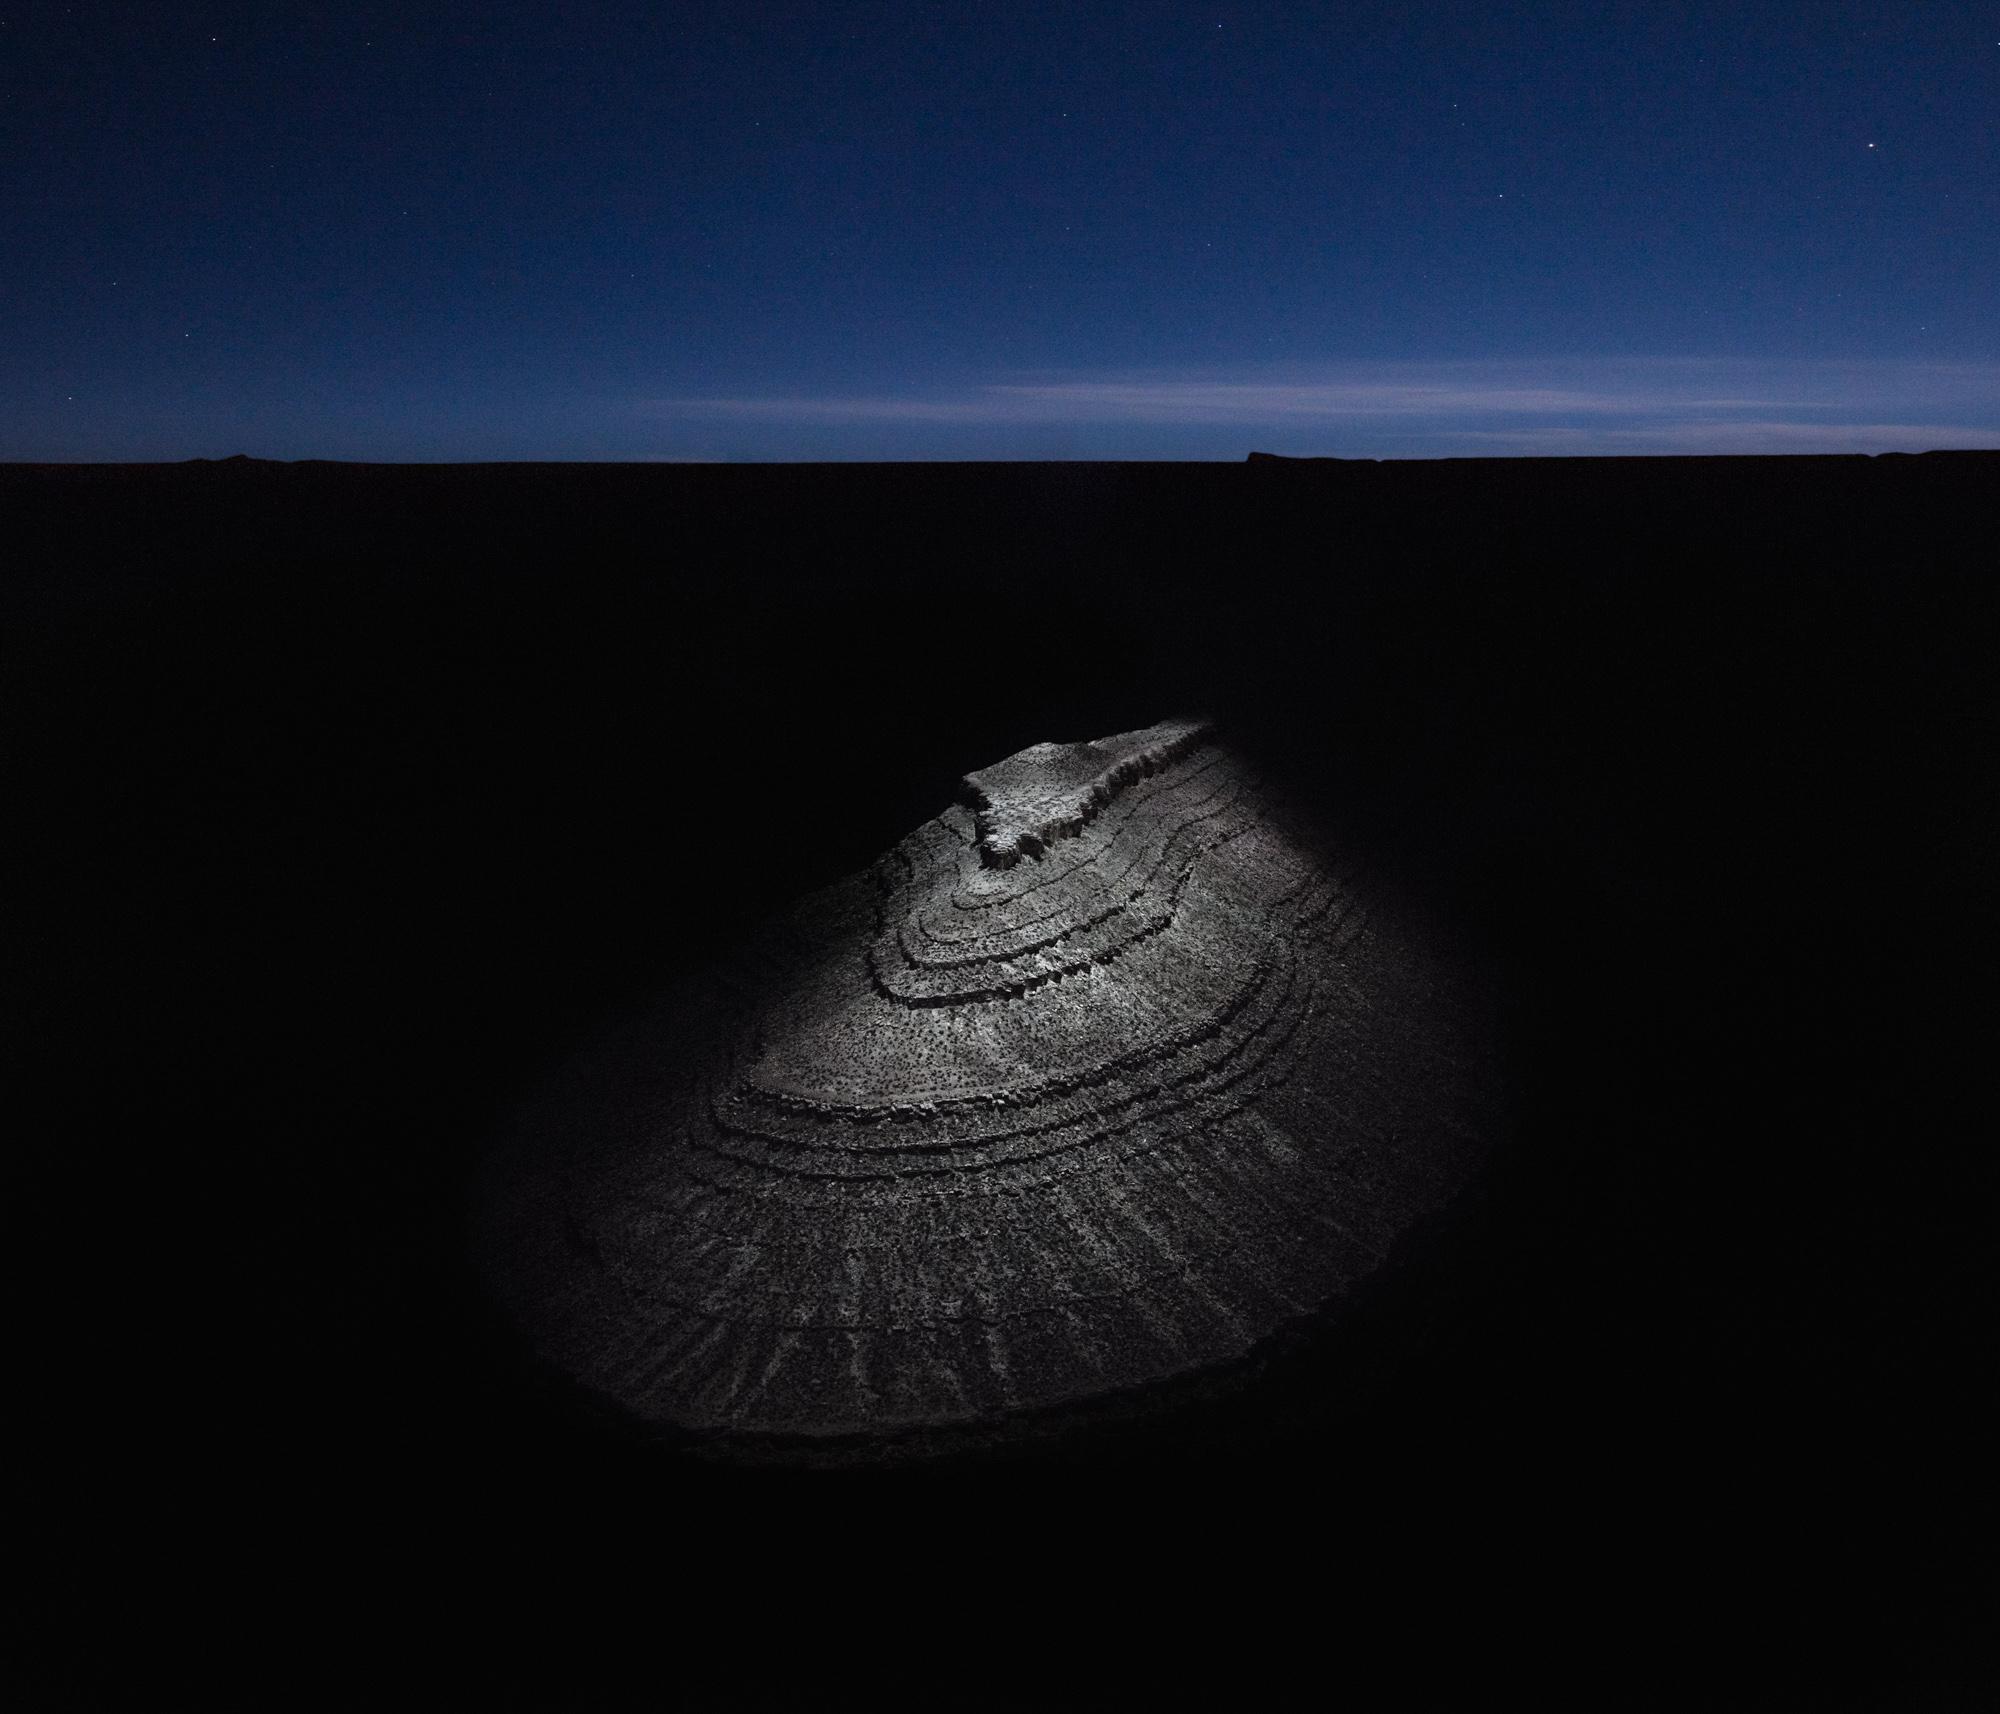 Image by:  Reuben Wu - Lux Noctis 2k-8